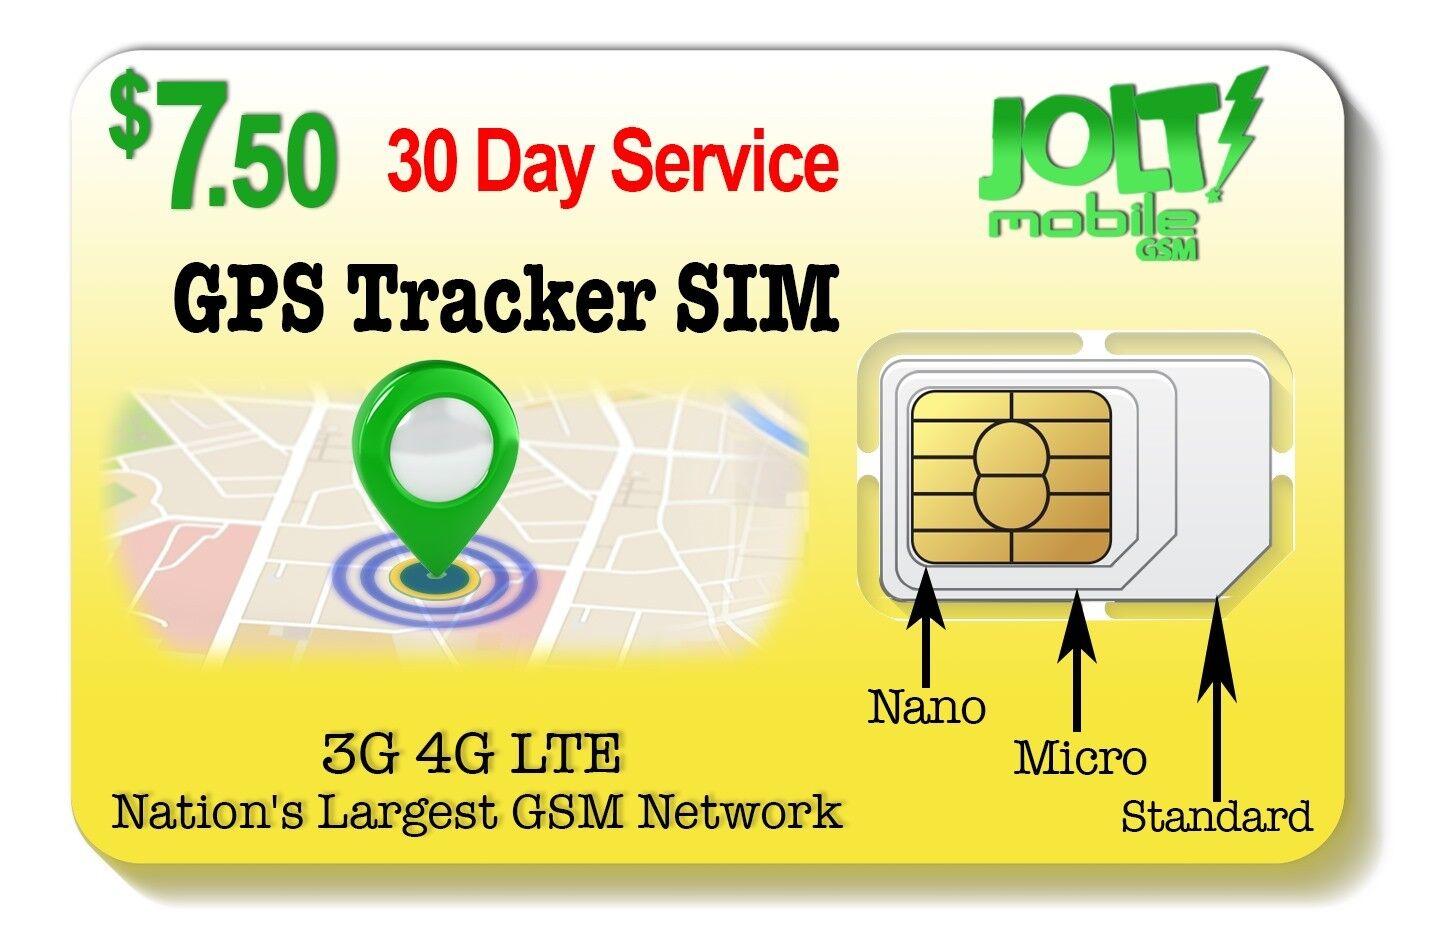 SpeedTalk Mobile $5 Prepaid GSM Sim Card For GPS Tracking Pet Senior Kid Child